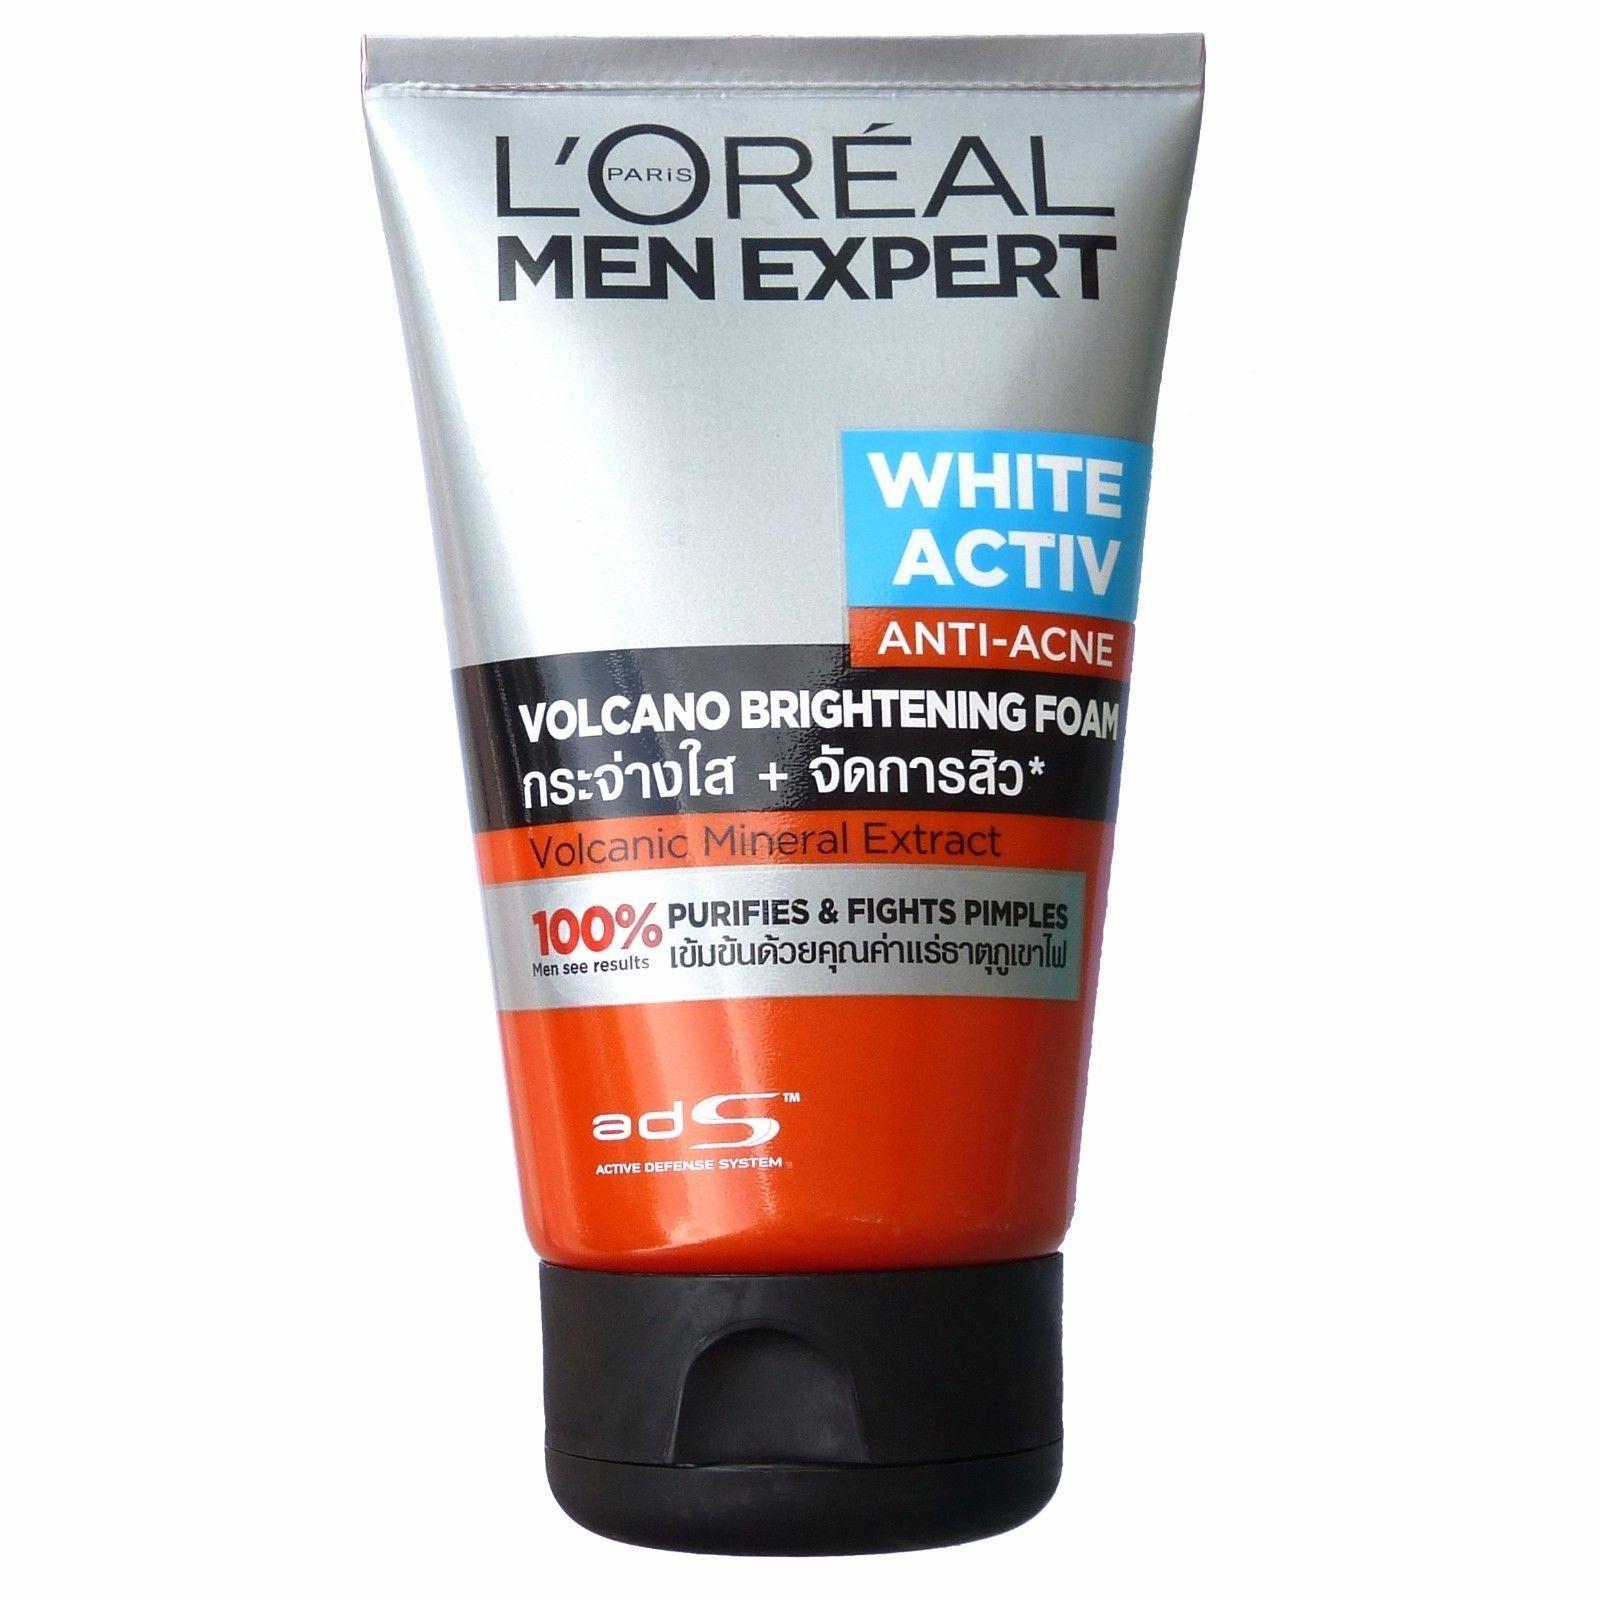 L'Oreal Men Expert White Activ Anti Acne Volcano